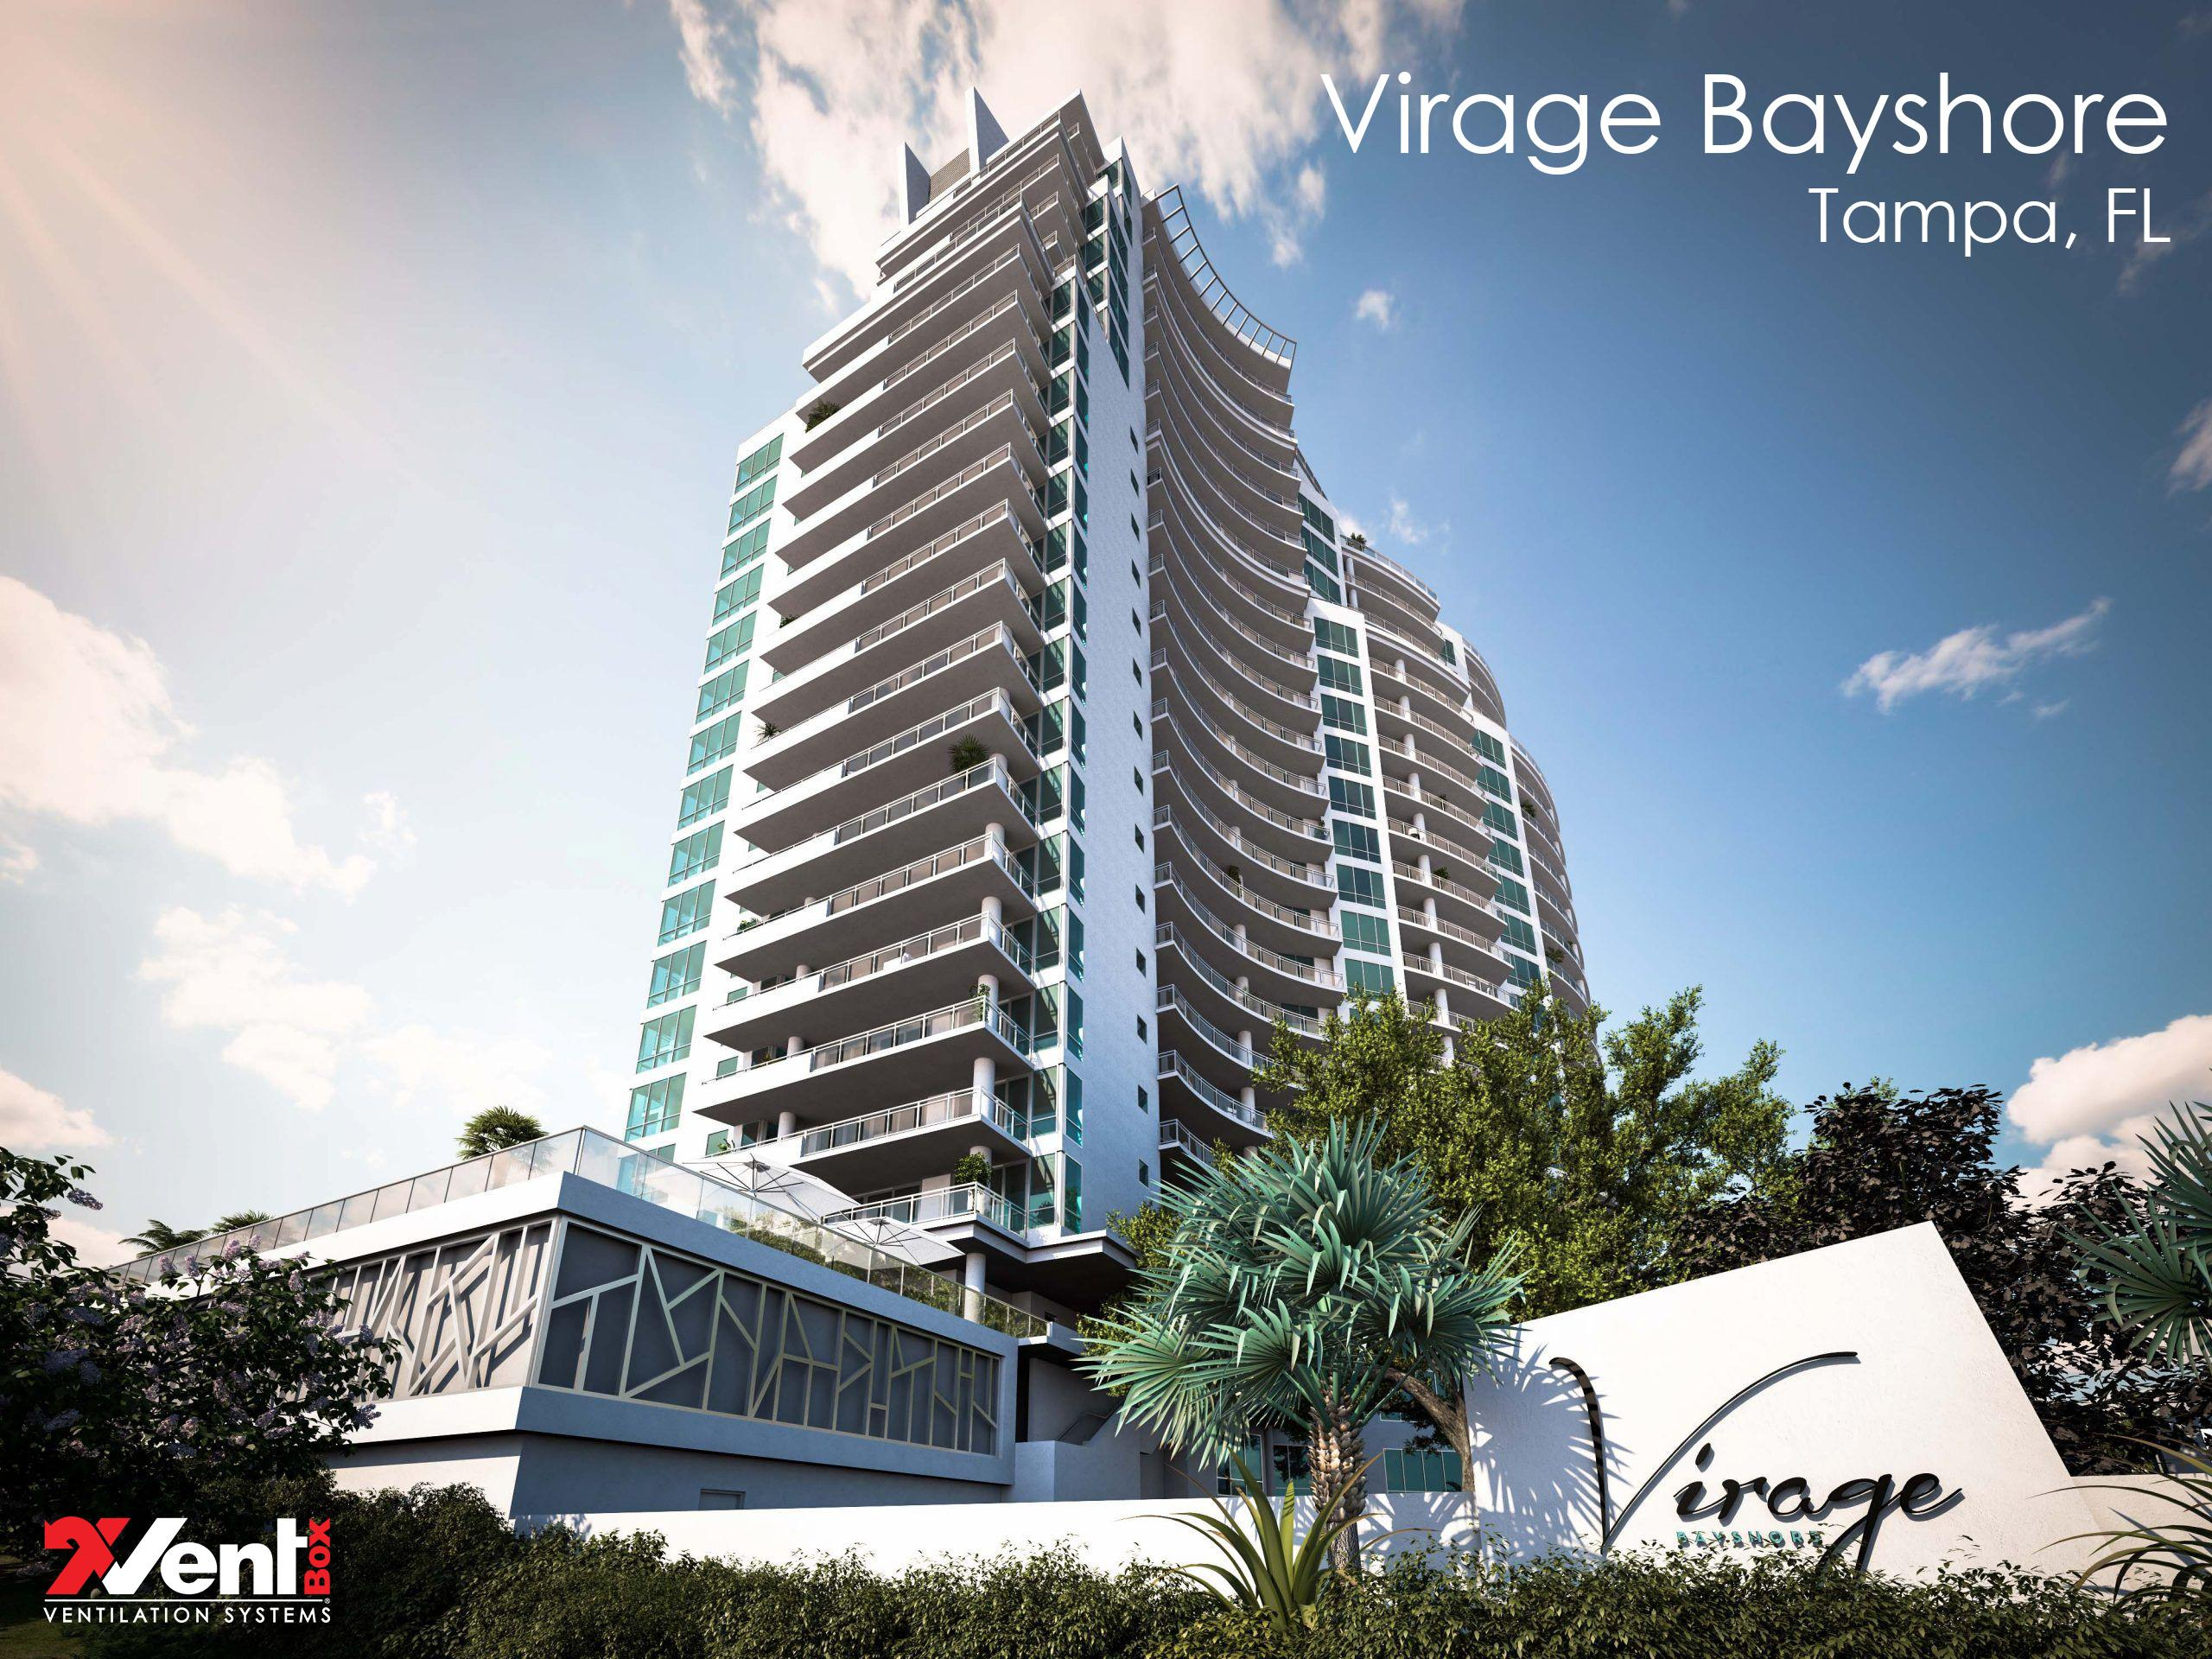 Virage Bayshore